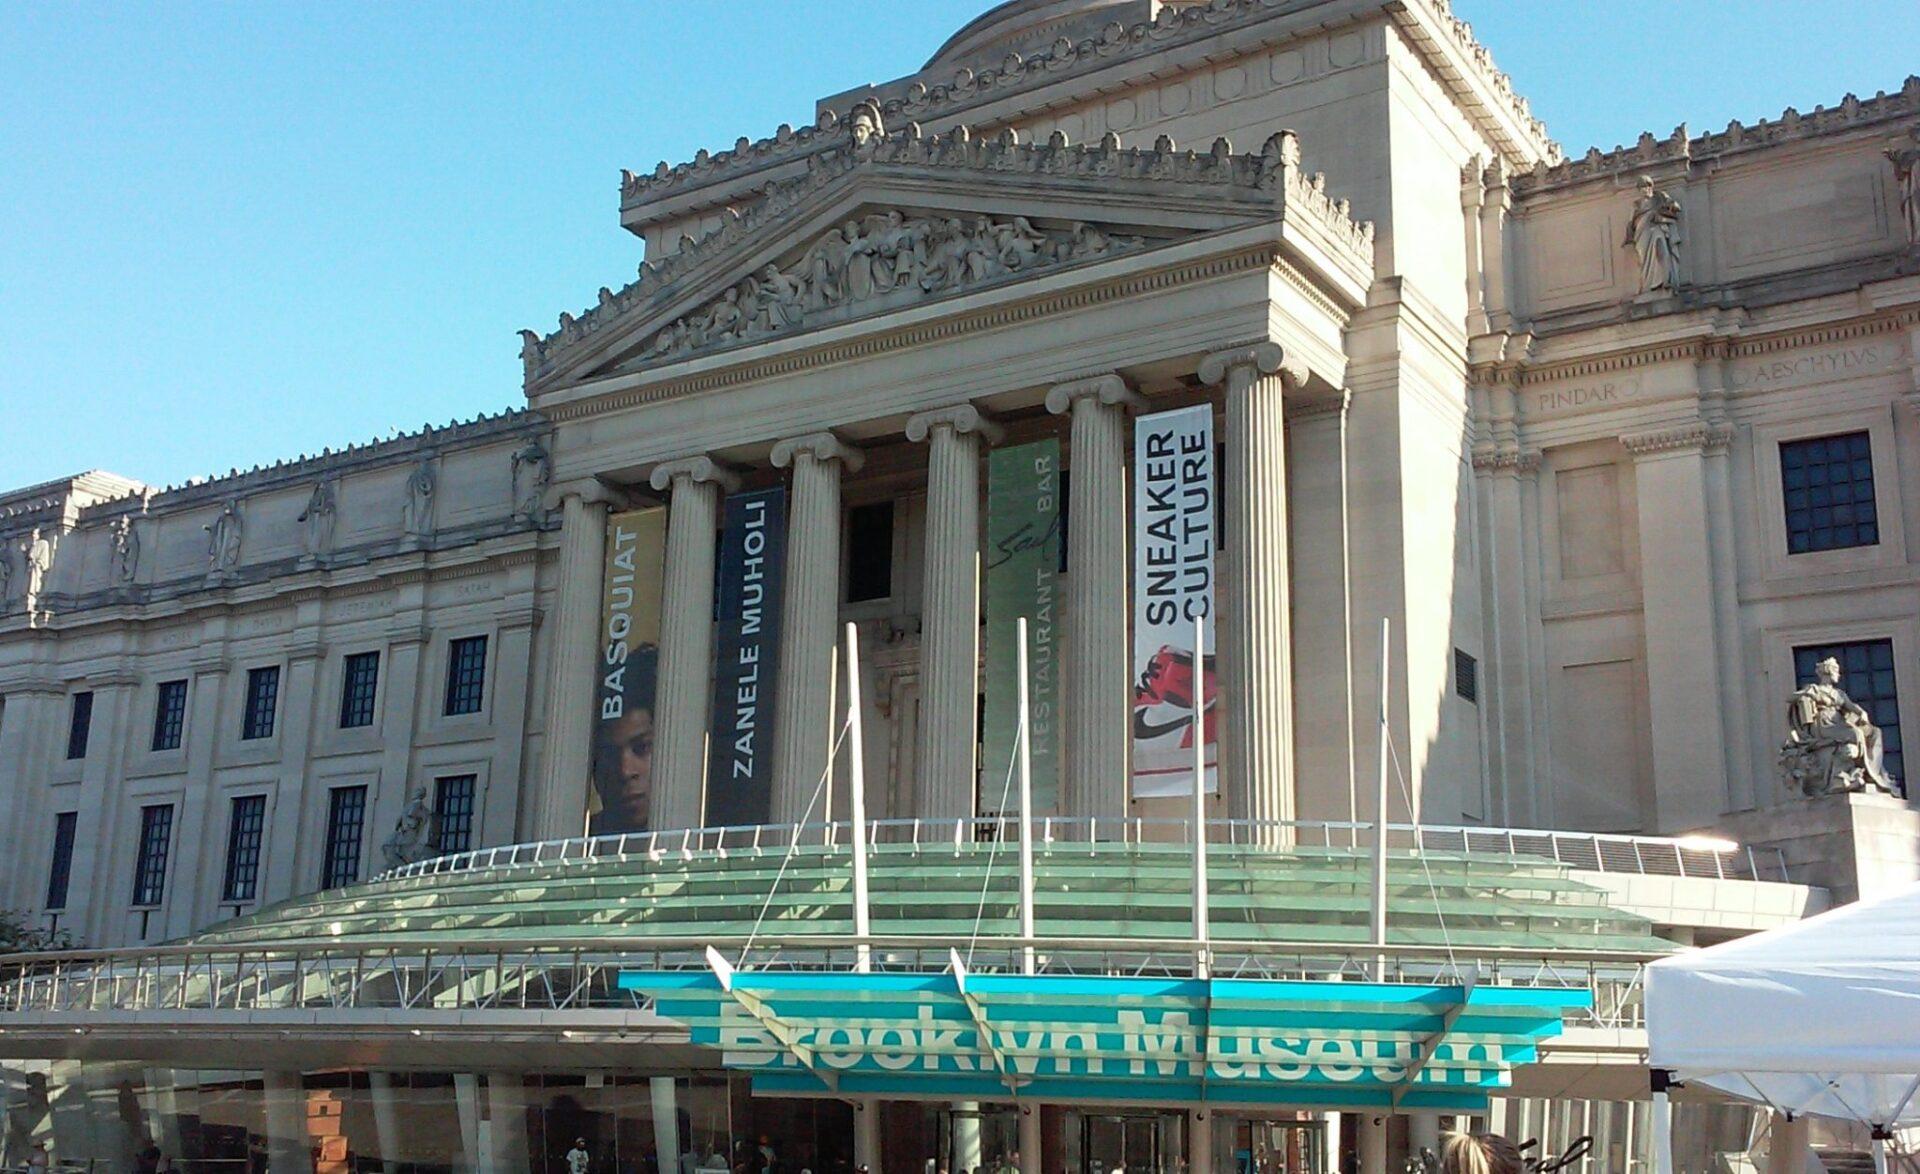 The Brooklyn Museum. Photo: Ilaria M. P. Barzaghi.